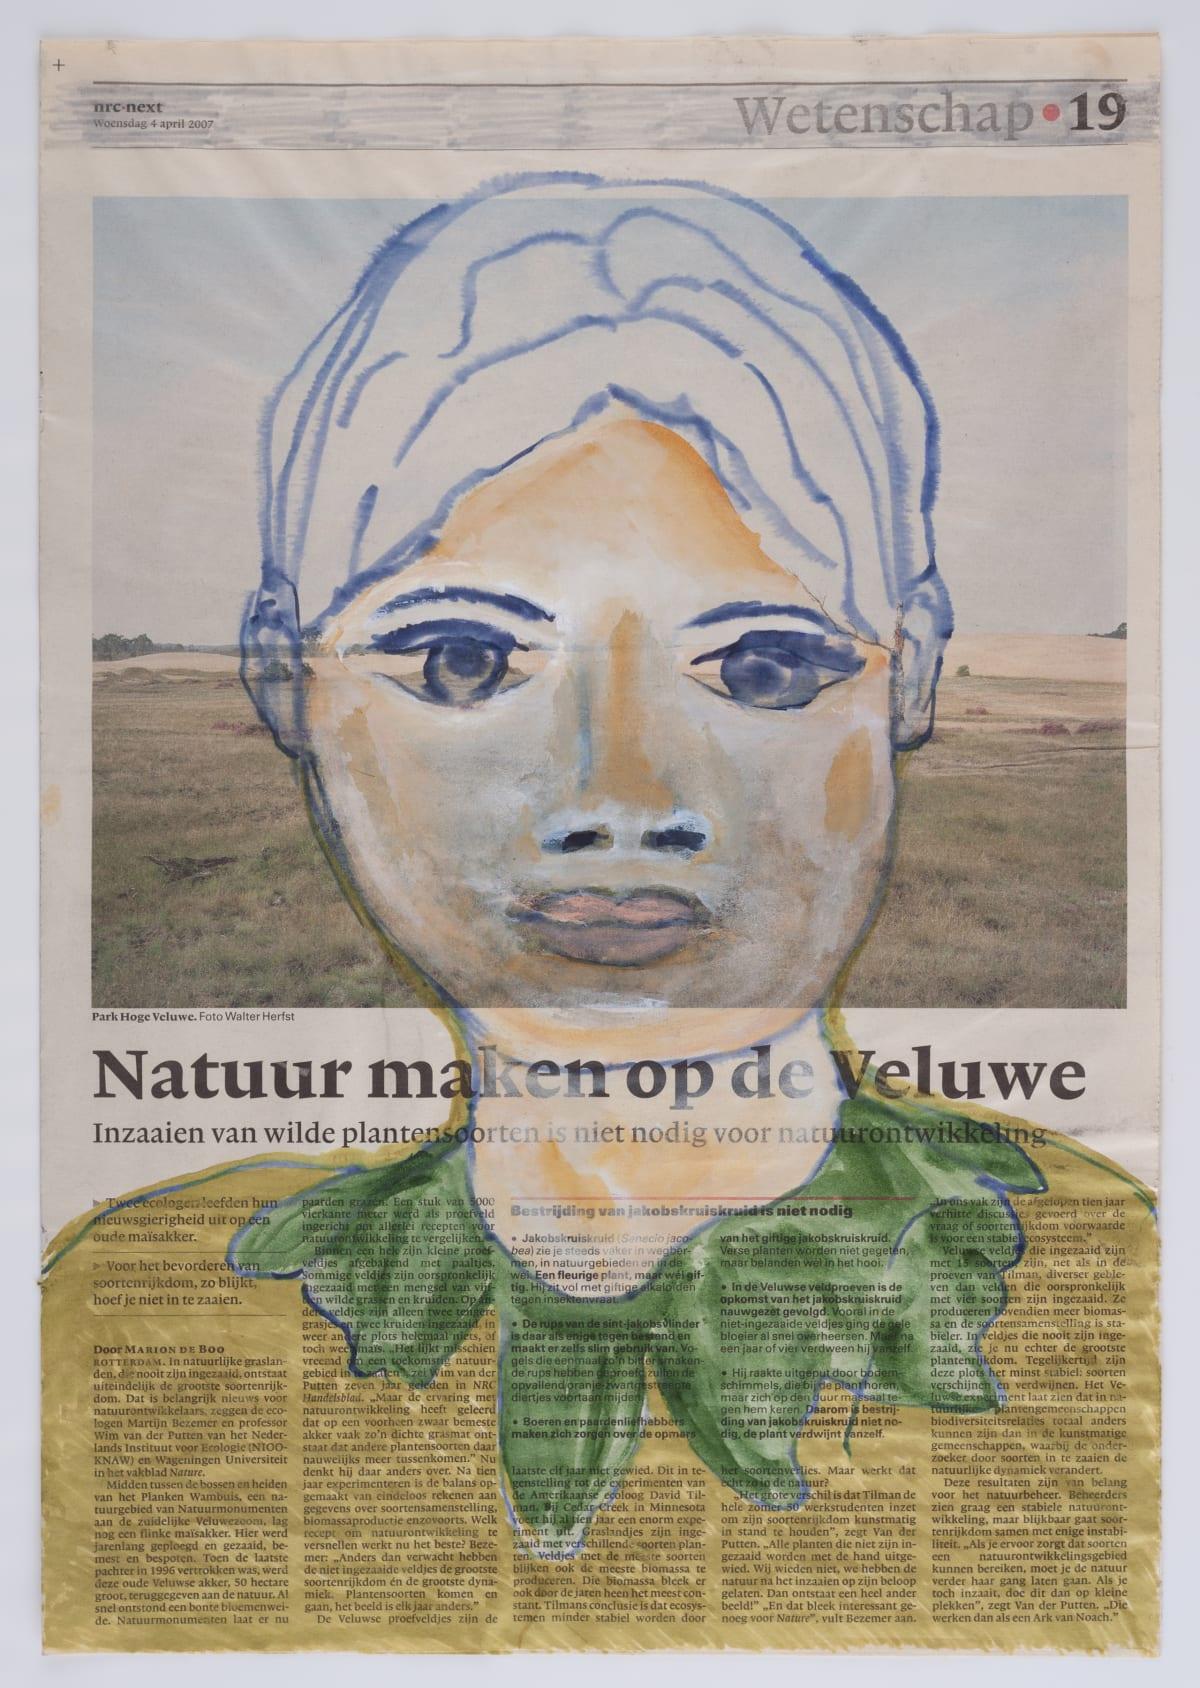 Yvette Taminiau, Nature, 2007